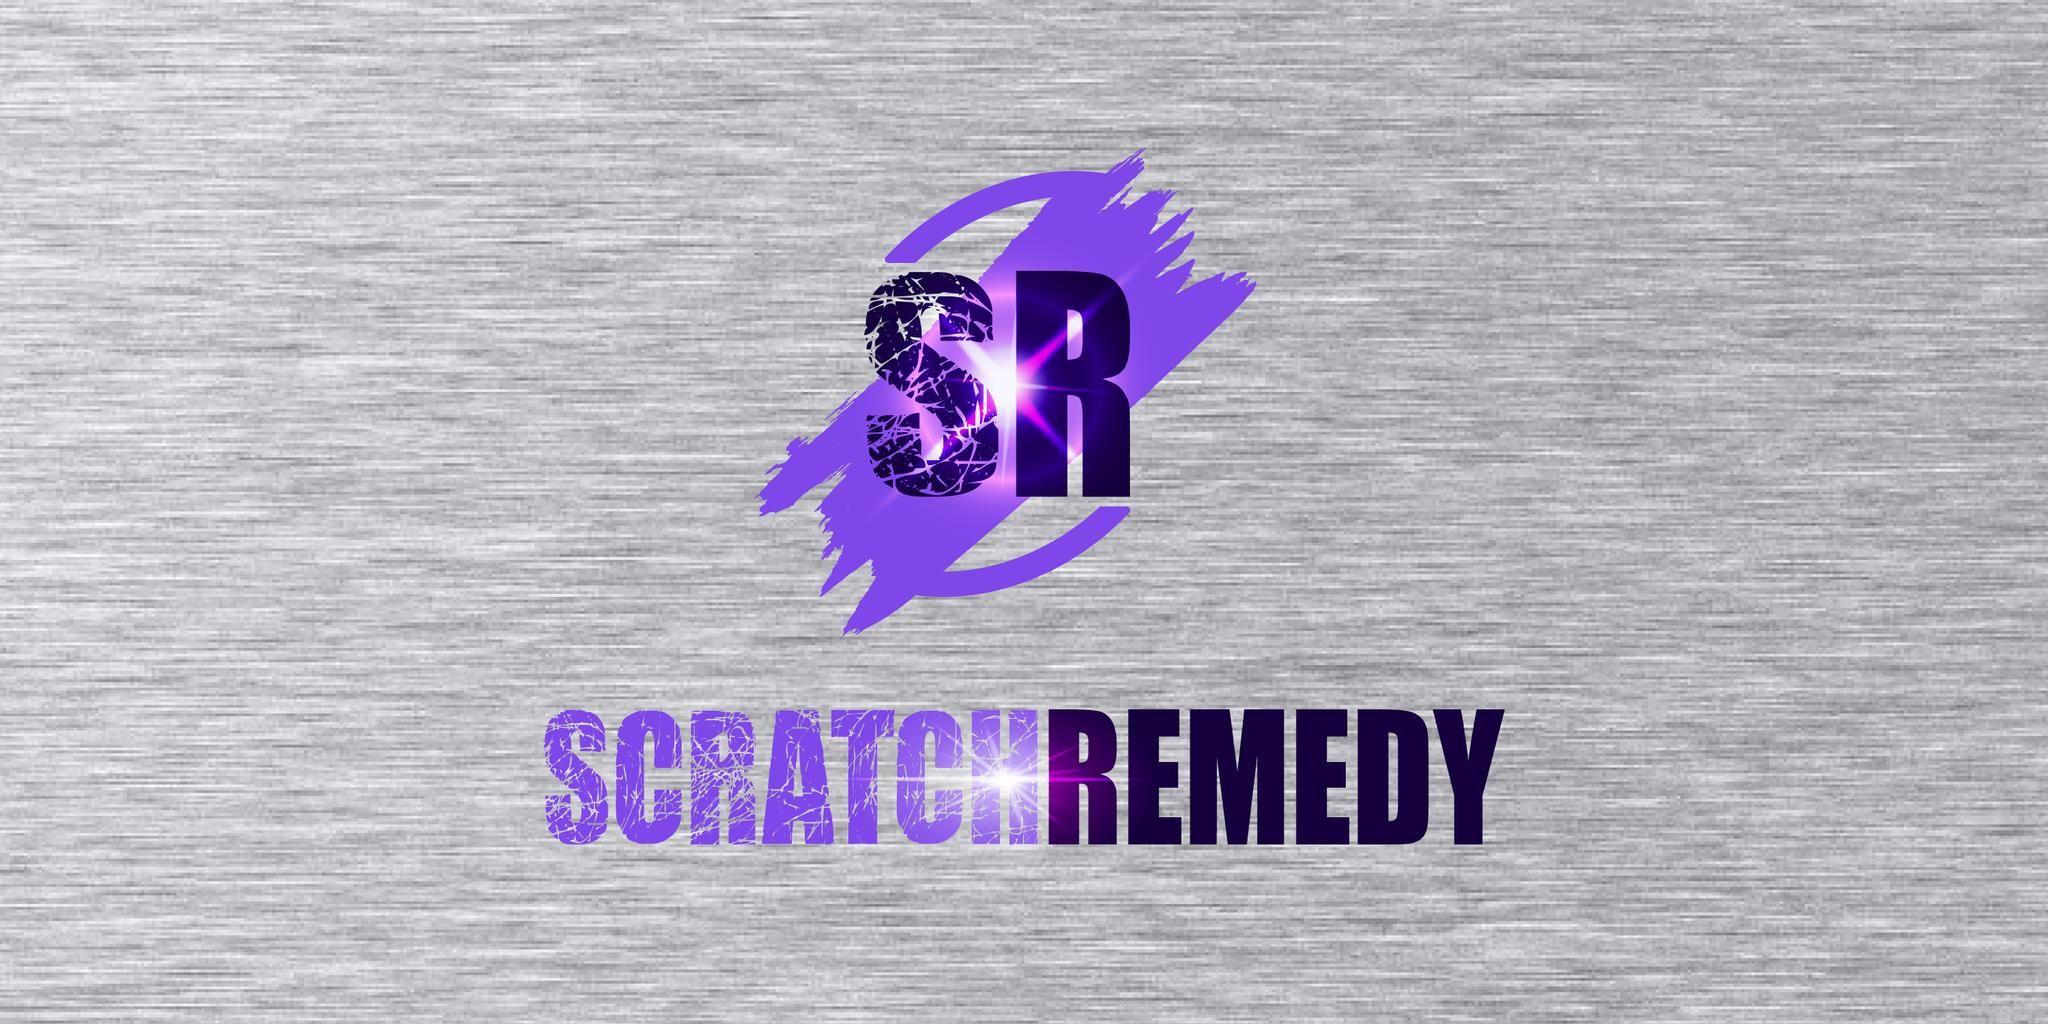 Scratch Remedy